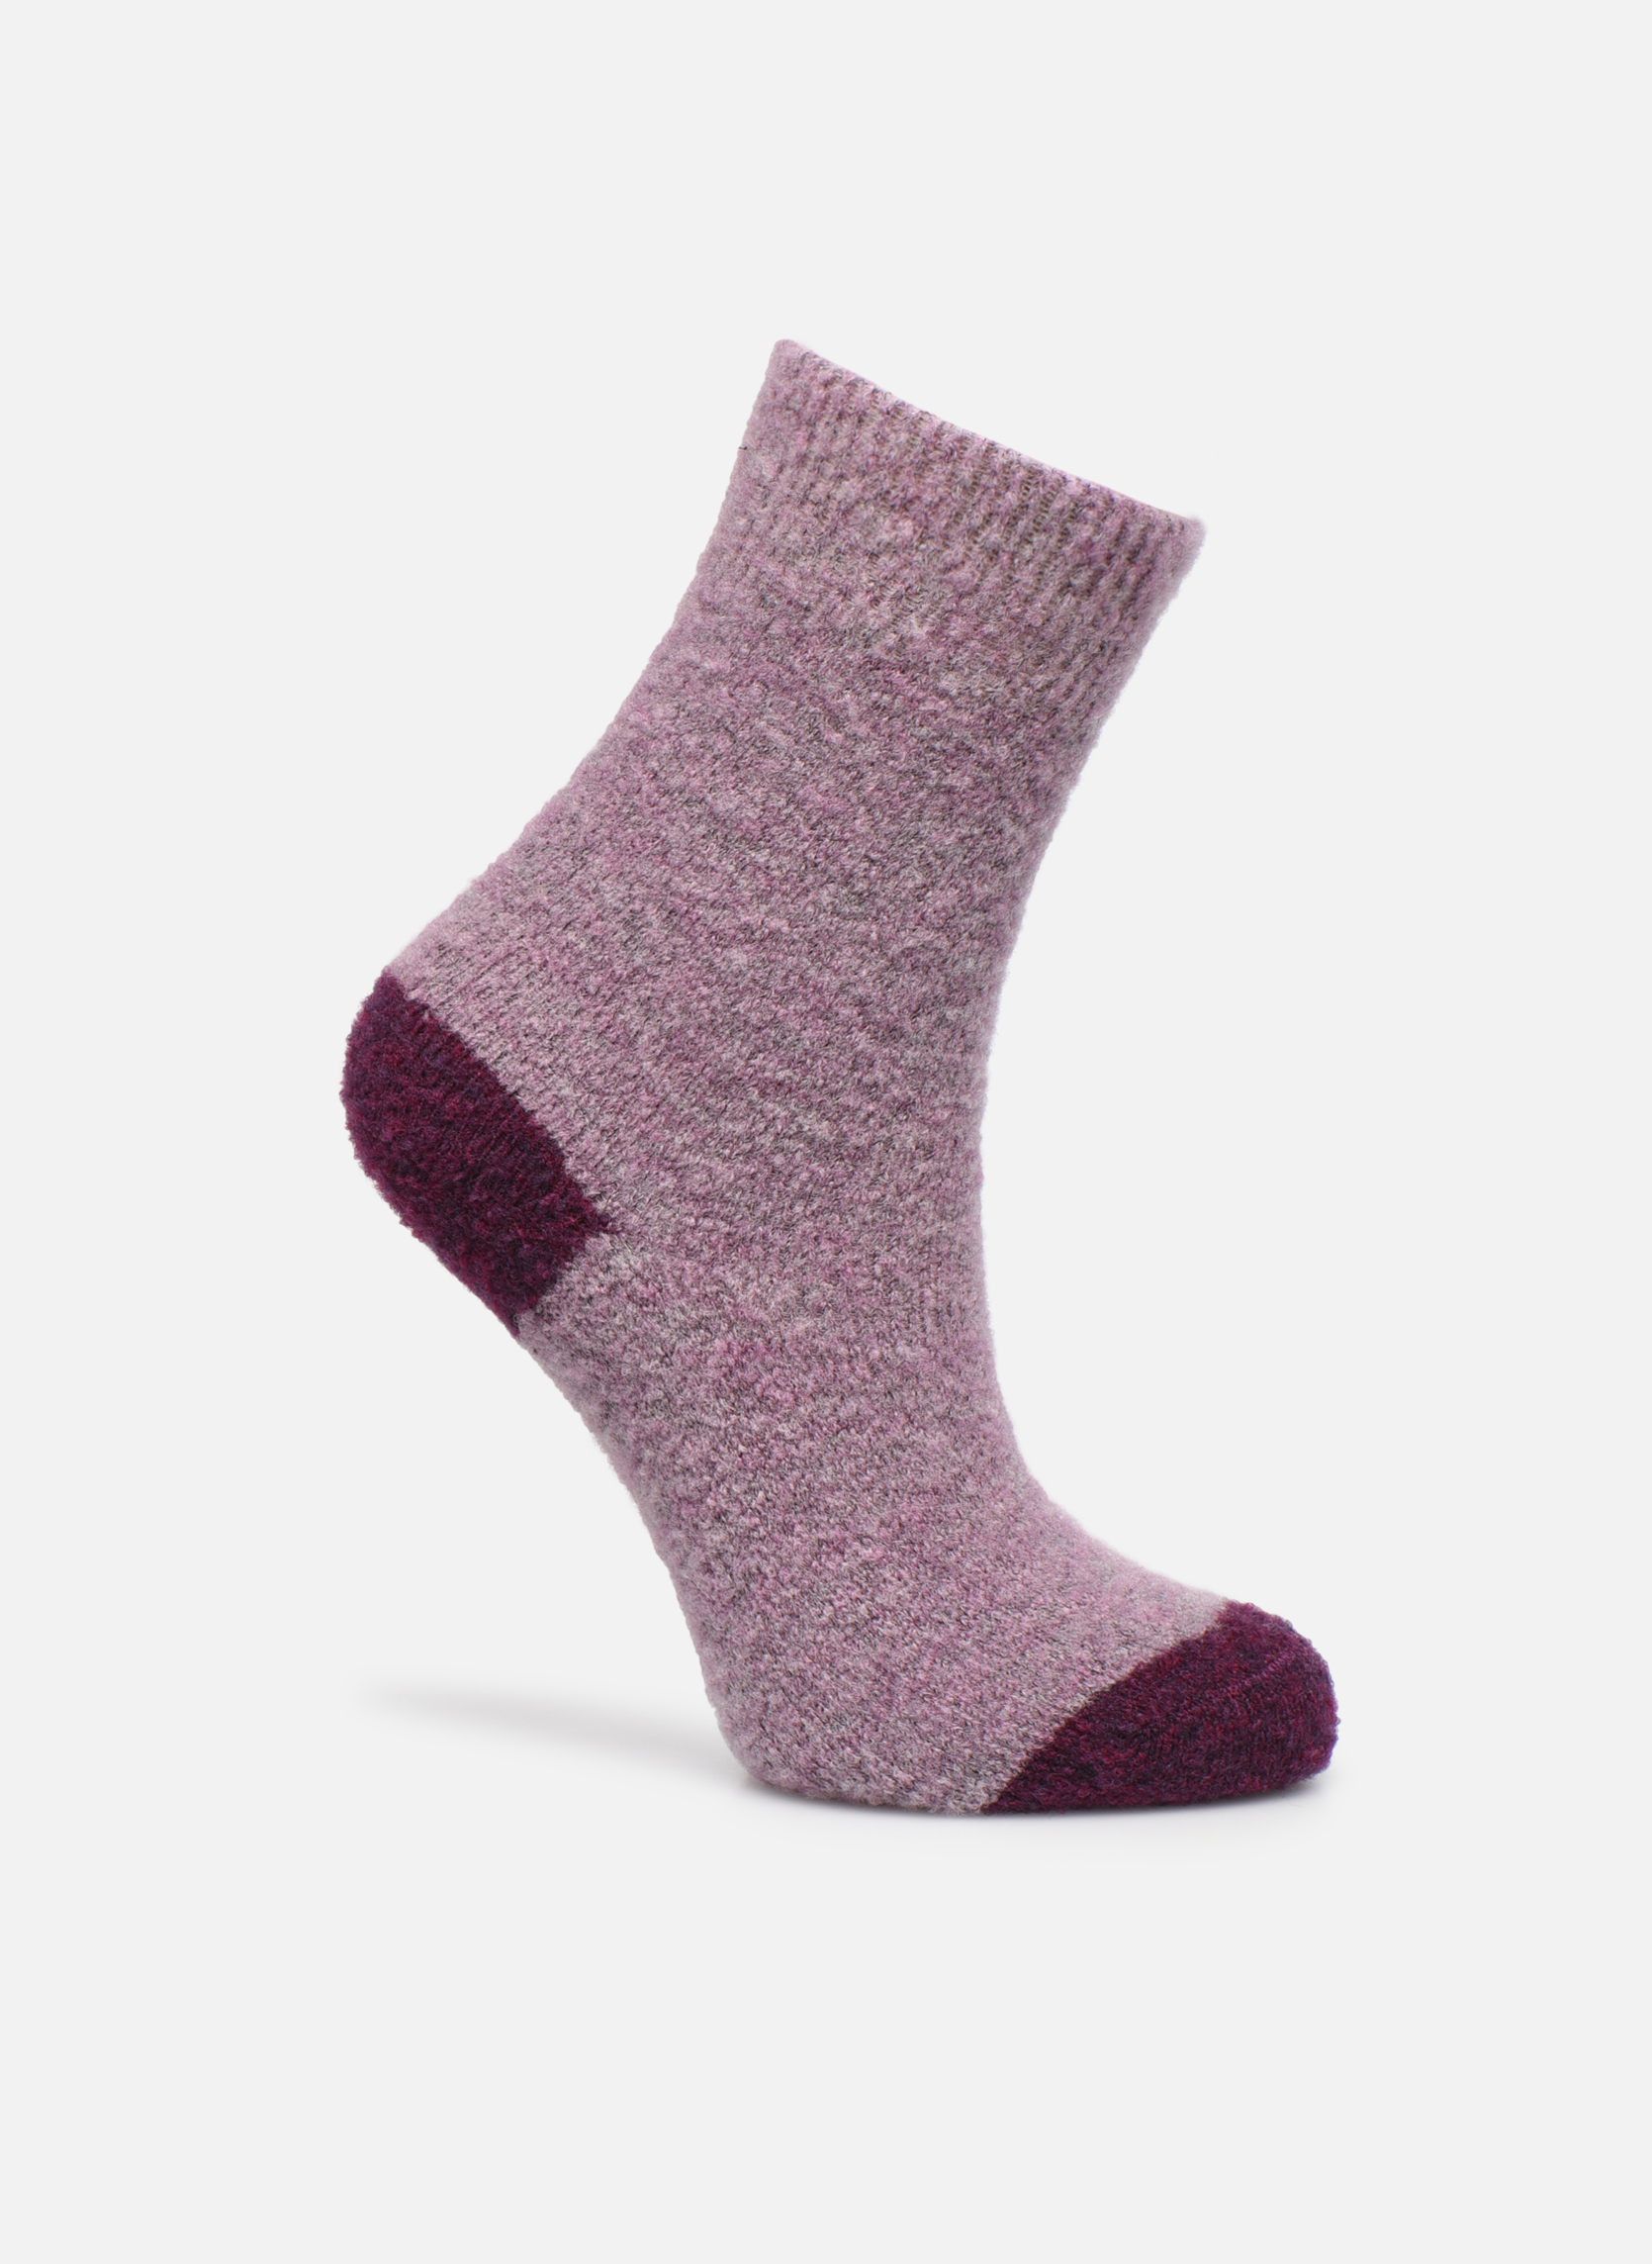 Socken & Strumpfhosen Accessoires Socken ARCTIQUE